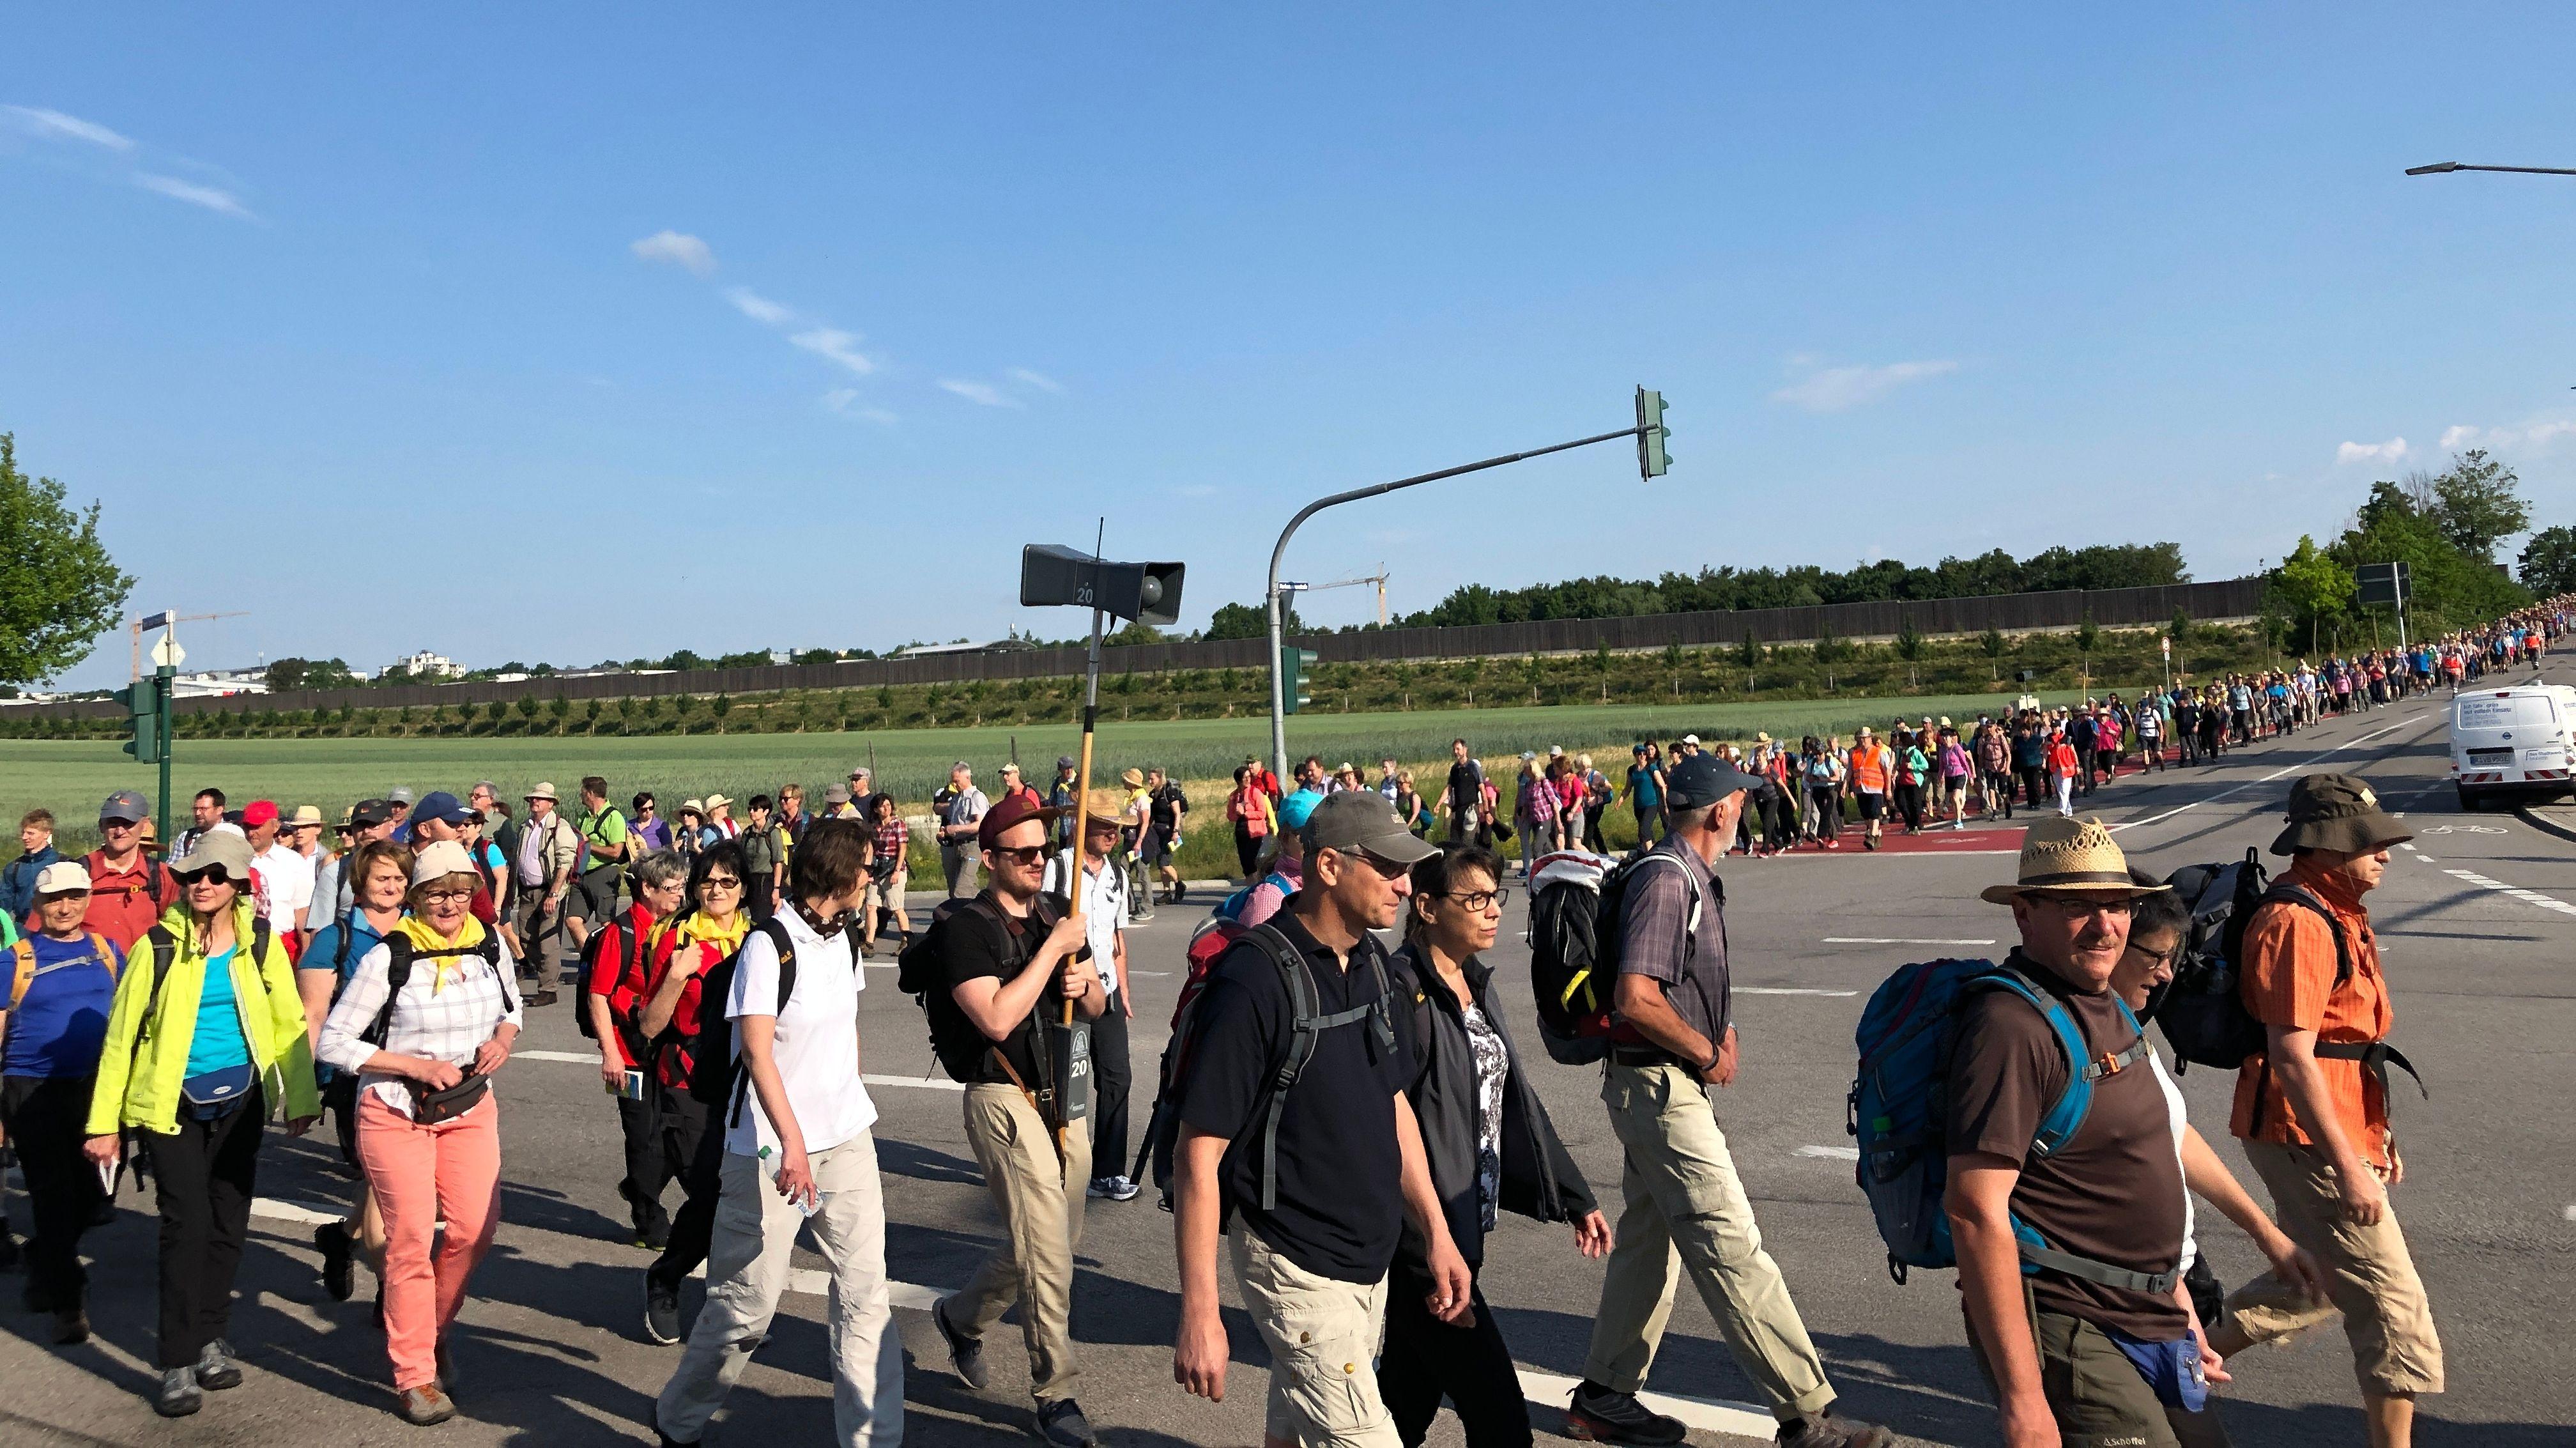 Tausende Pilger auf dem Weg nach Altötting